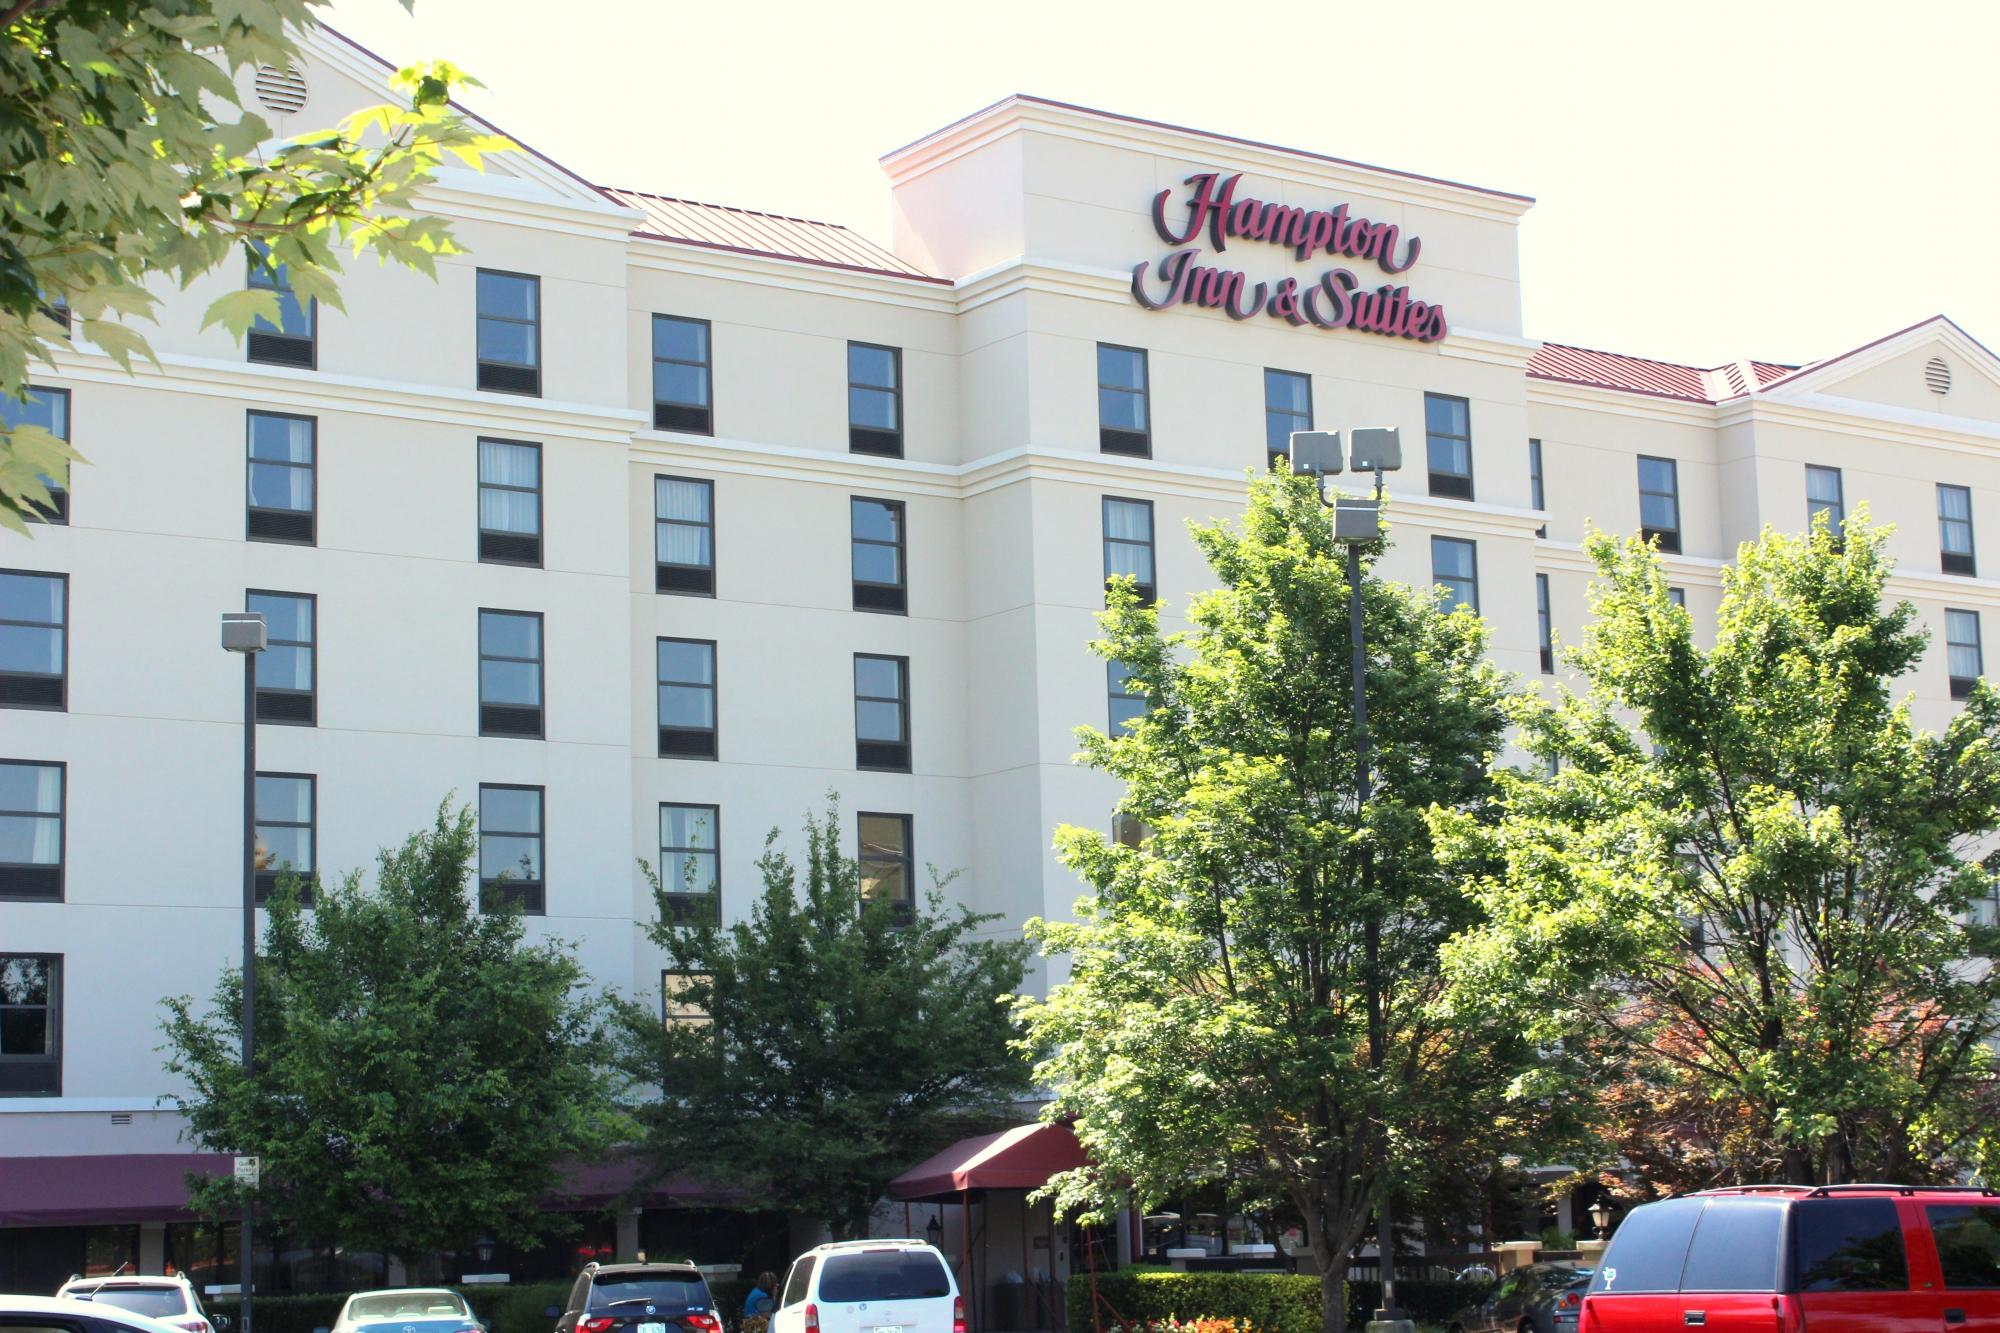 Hampton Inn Suites Concord Charlotte Nc 2017 Hotel